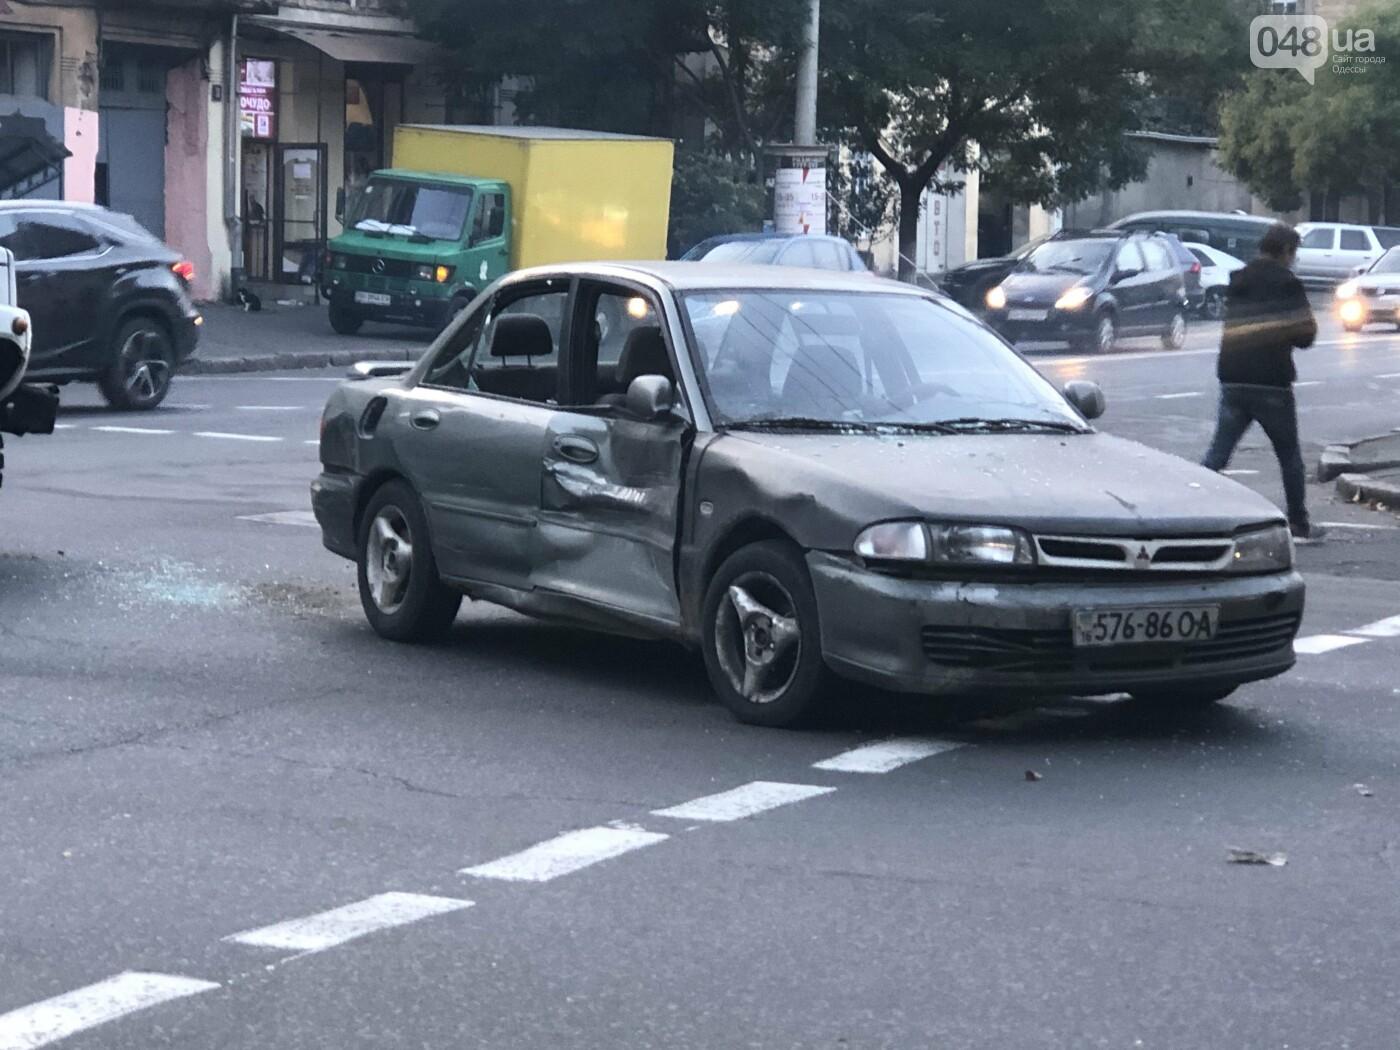 ДТП на улице Богдана Хмельницкого2